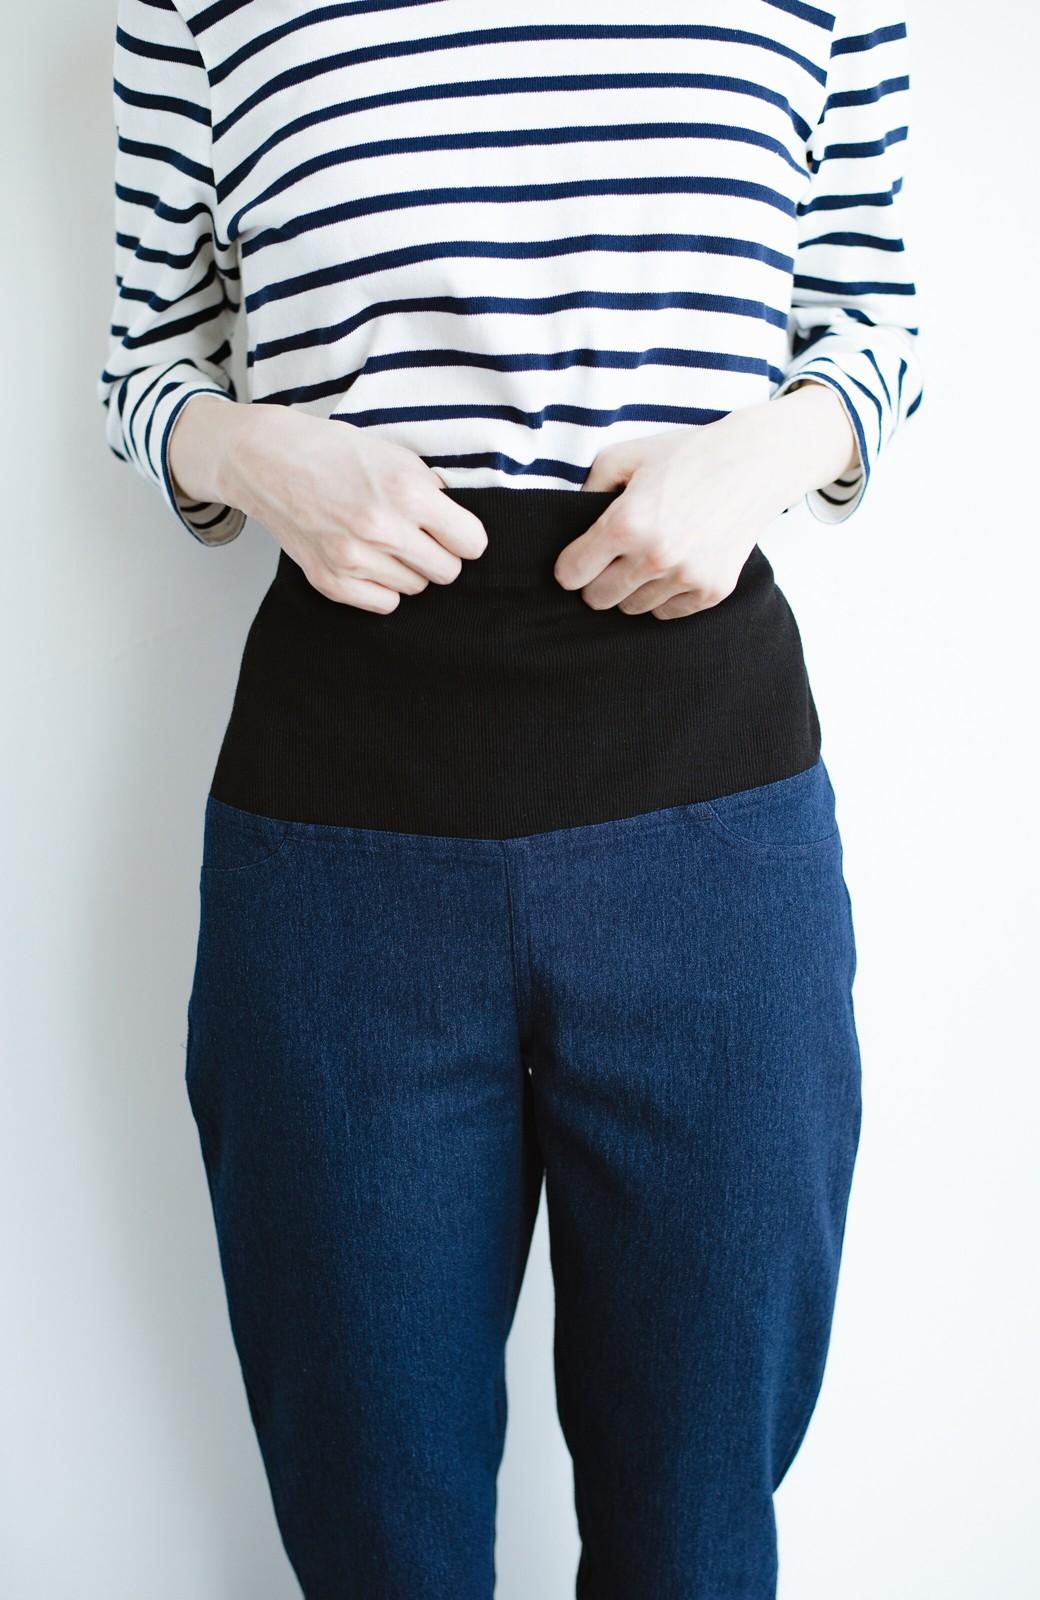 haco! おなかあったか安心感スキニーパンツ【ブルー期】女の子バンザイ!プロジェクト <ダークインディゴブルー>の商品写真12